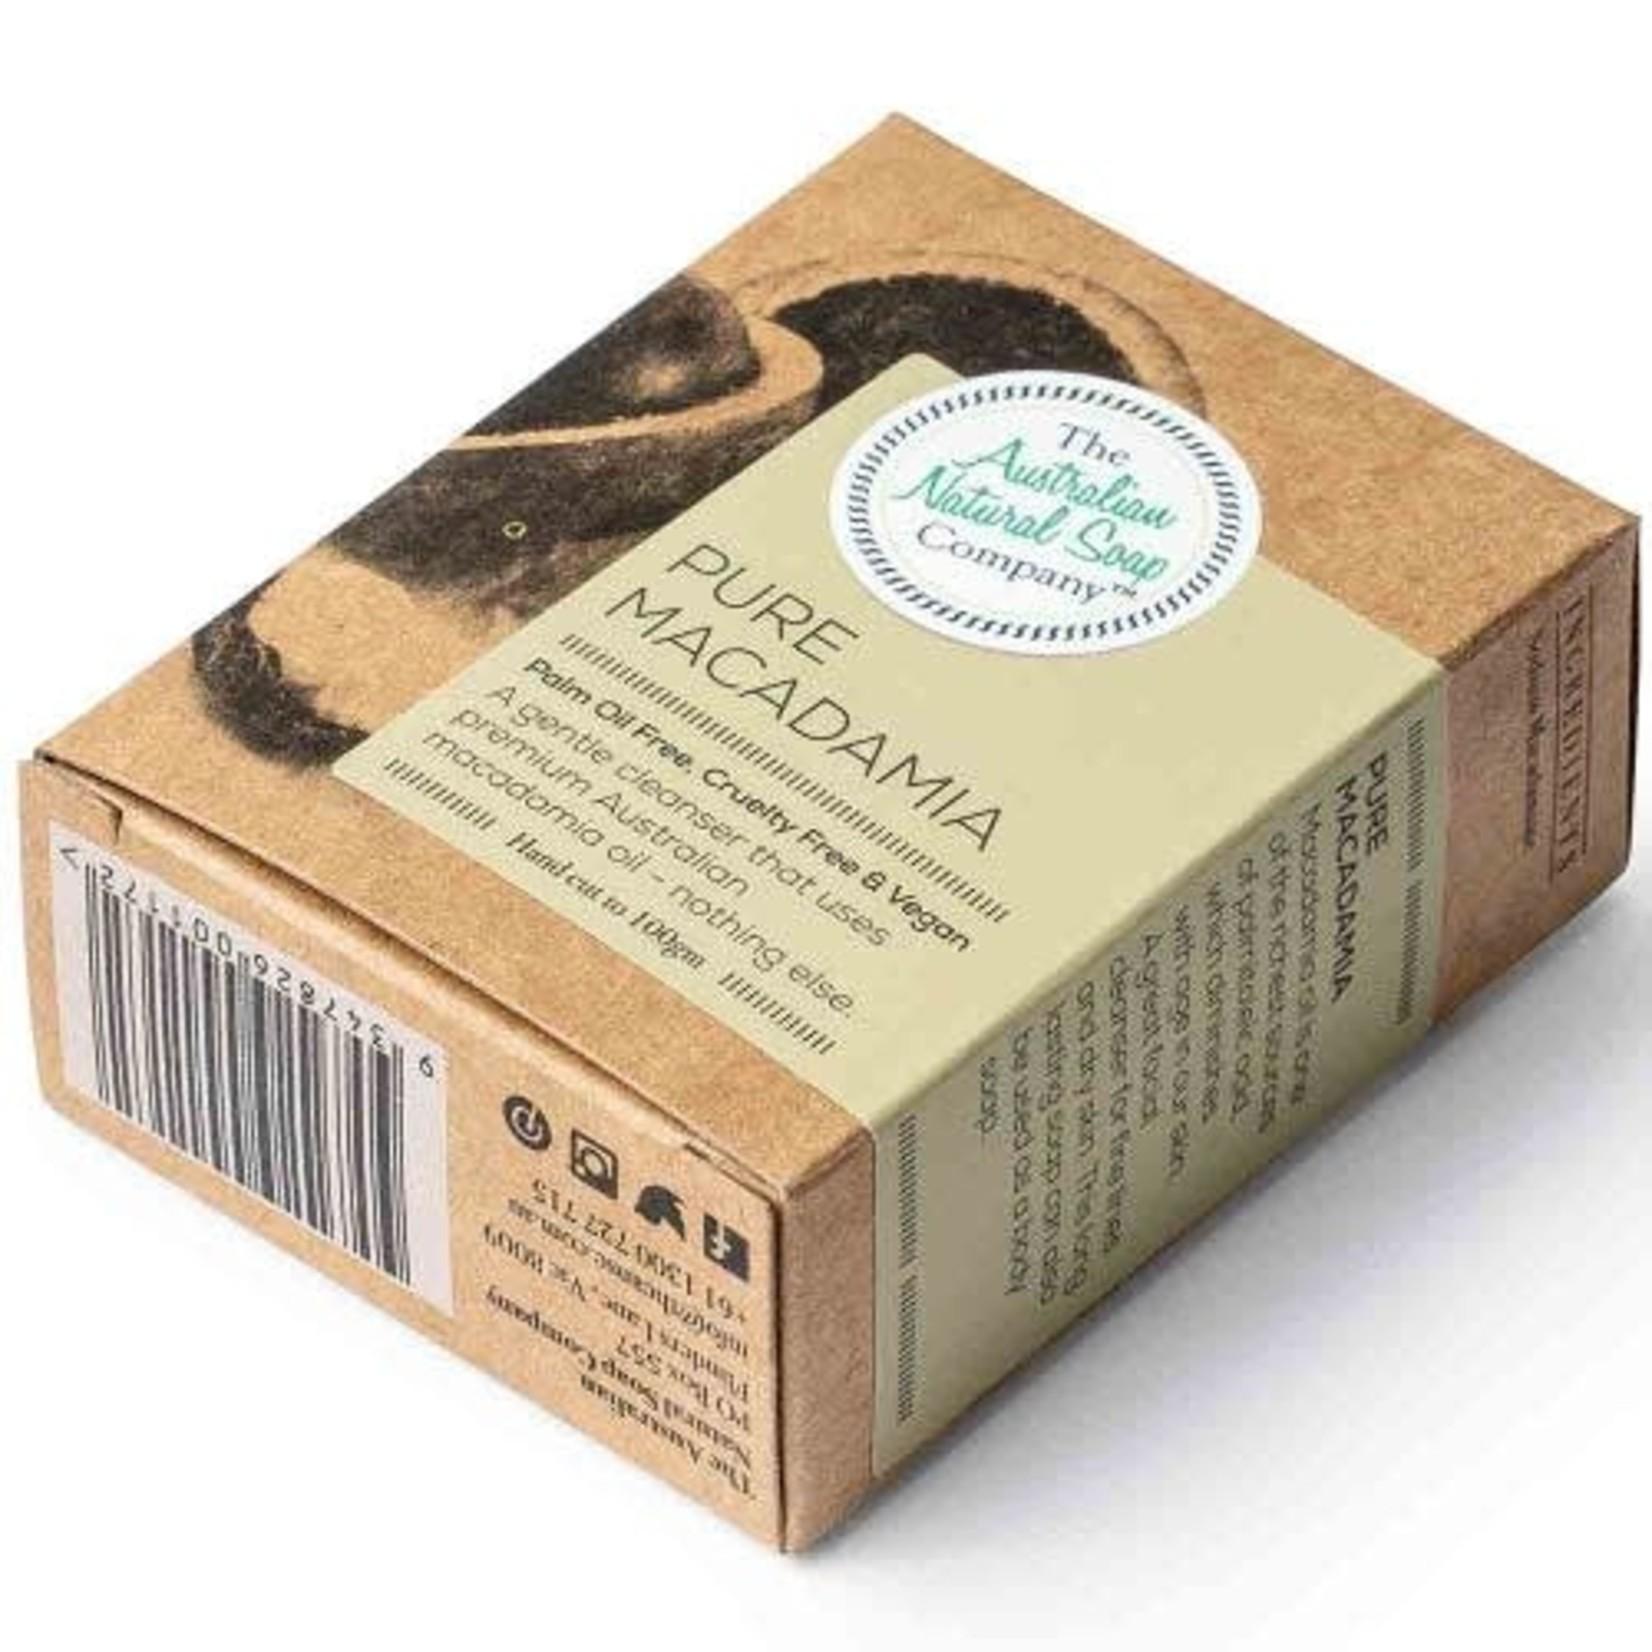 The Australian Natural Soap Company The Australian Natural Soap Company Pure Macadamia